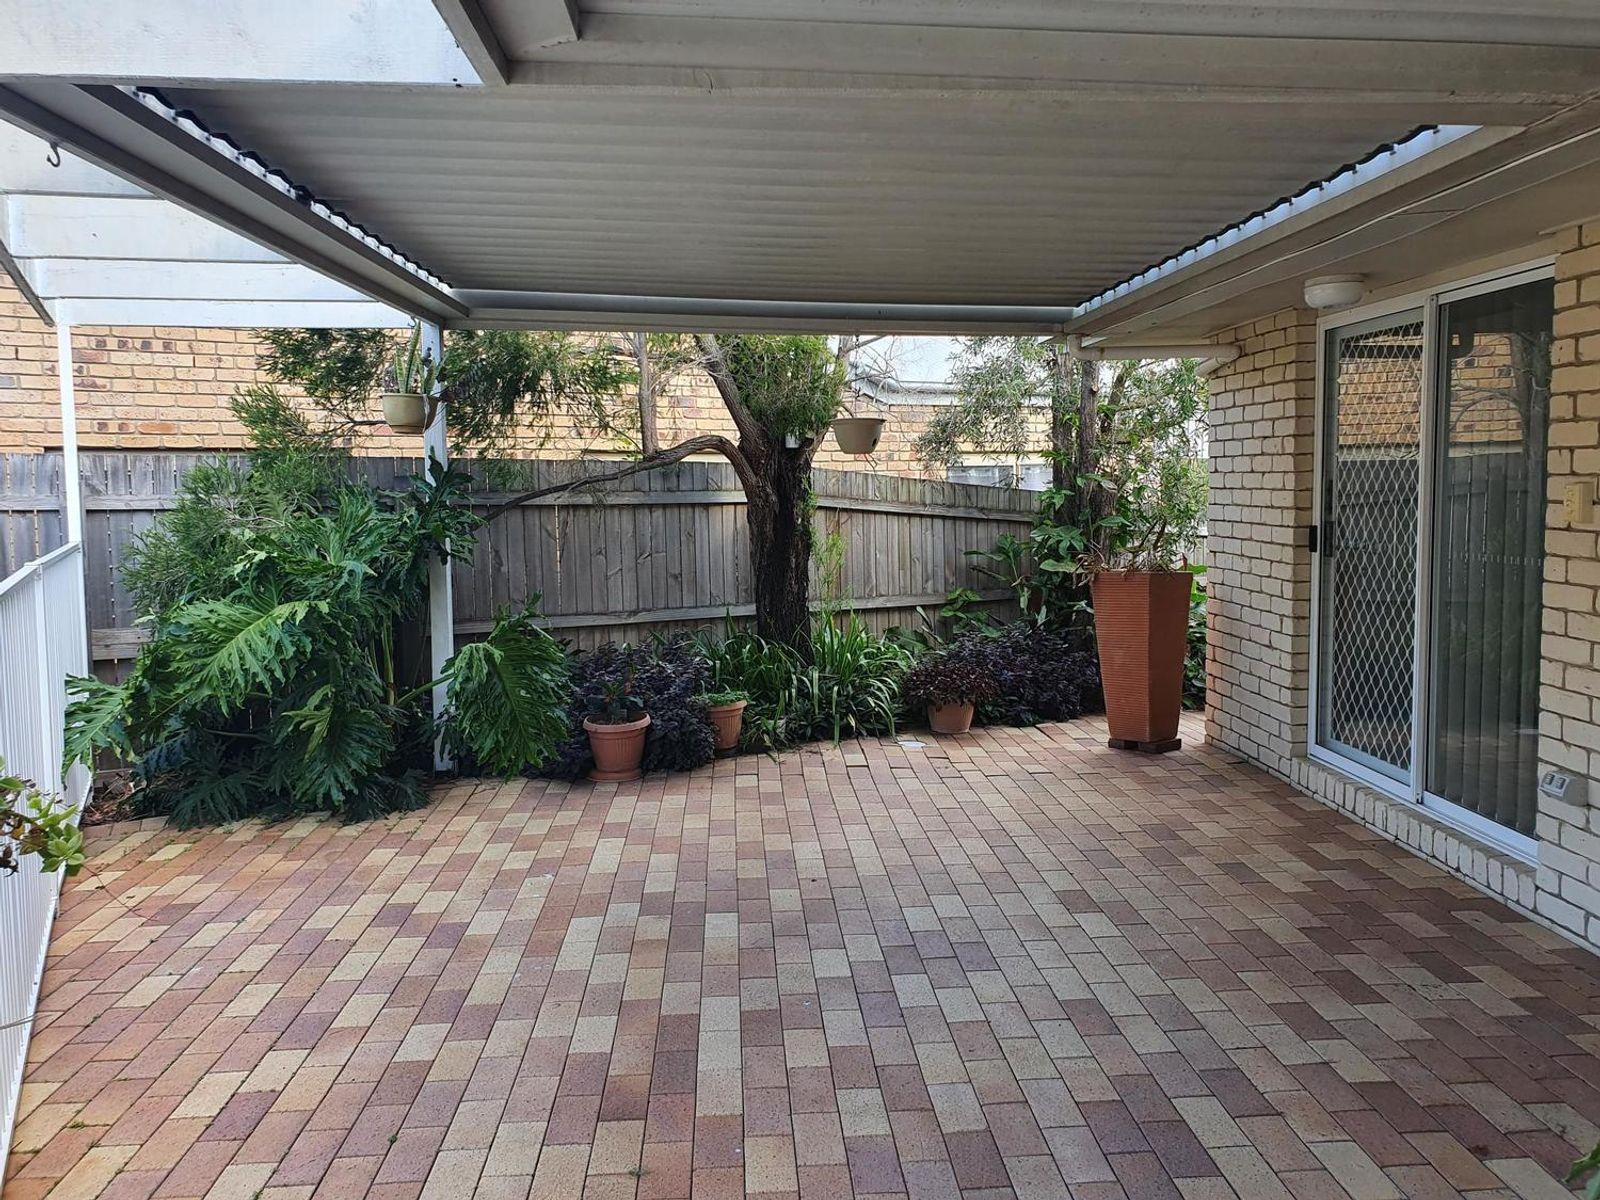 23 Sheldon Street, Calamvale, QLD 4116